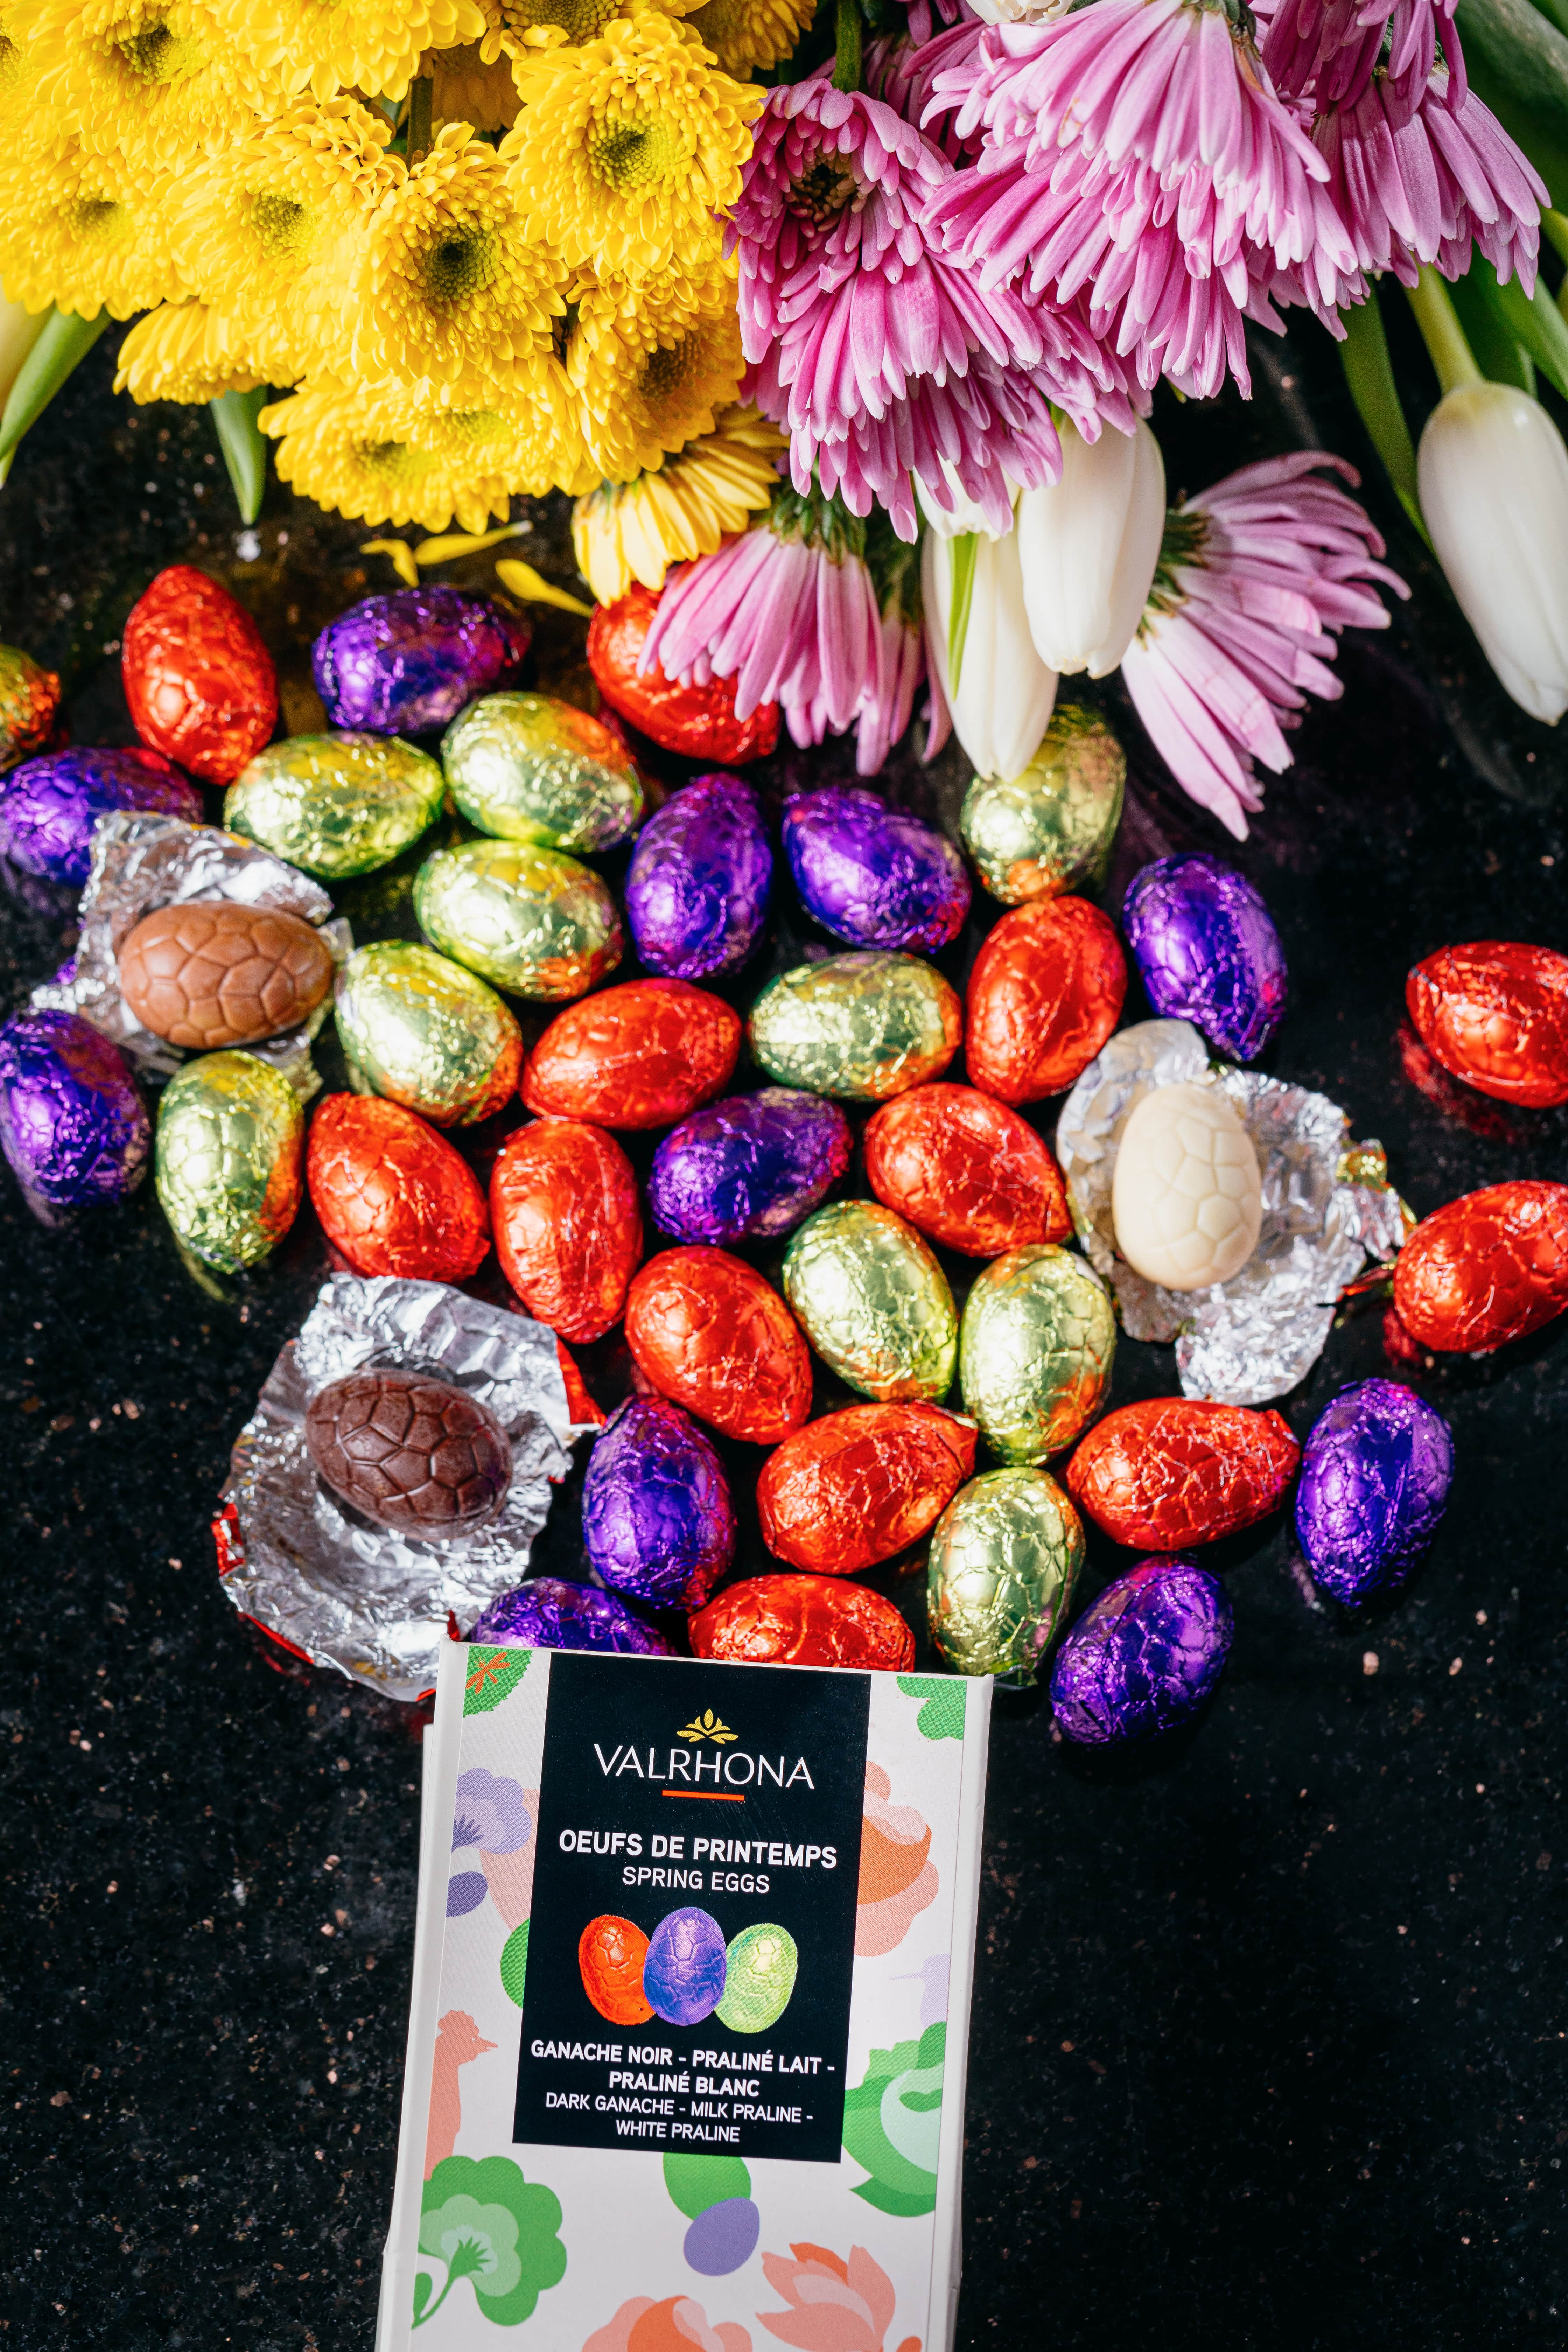 Spring Eggs gift box